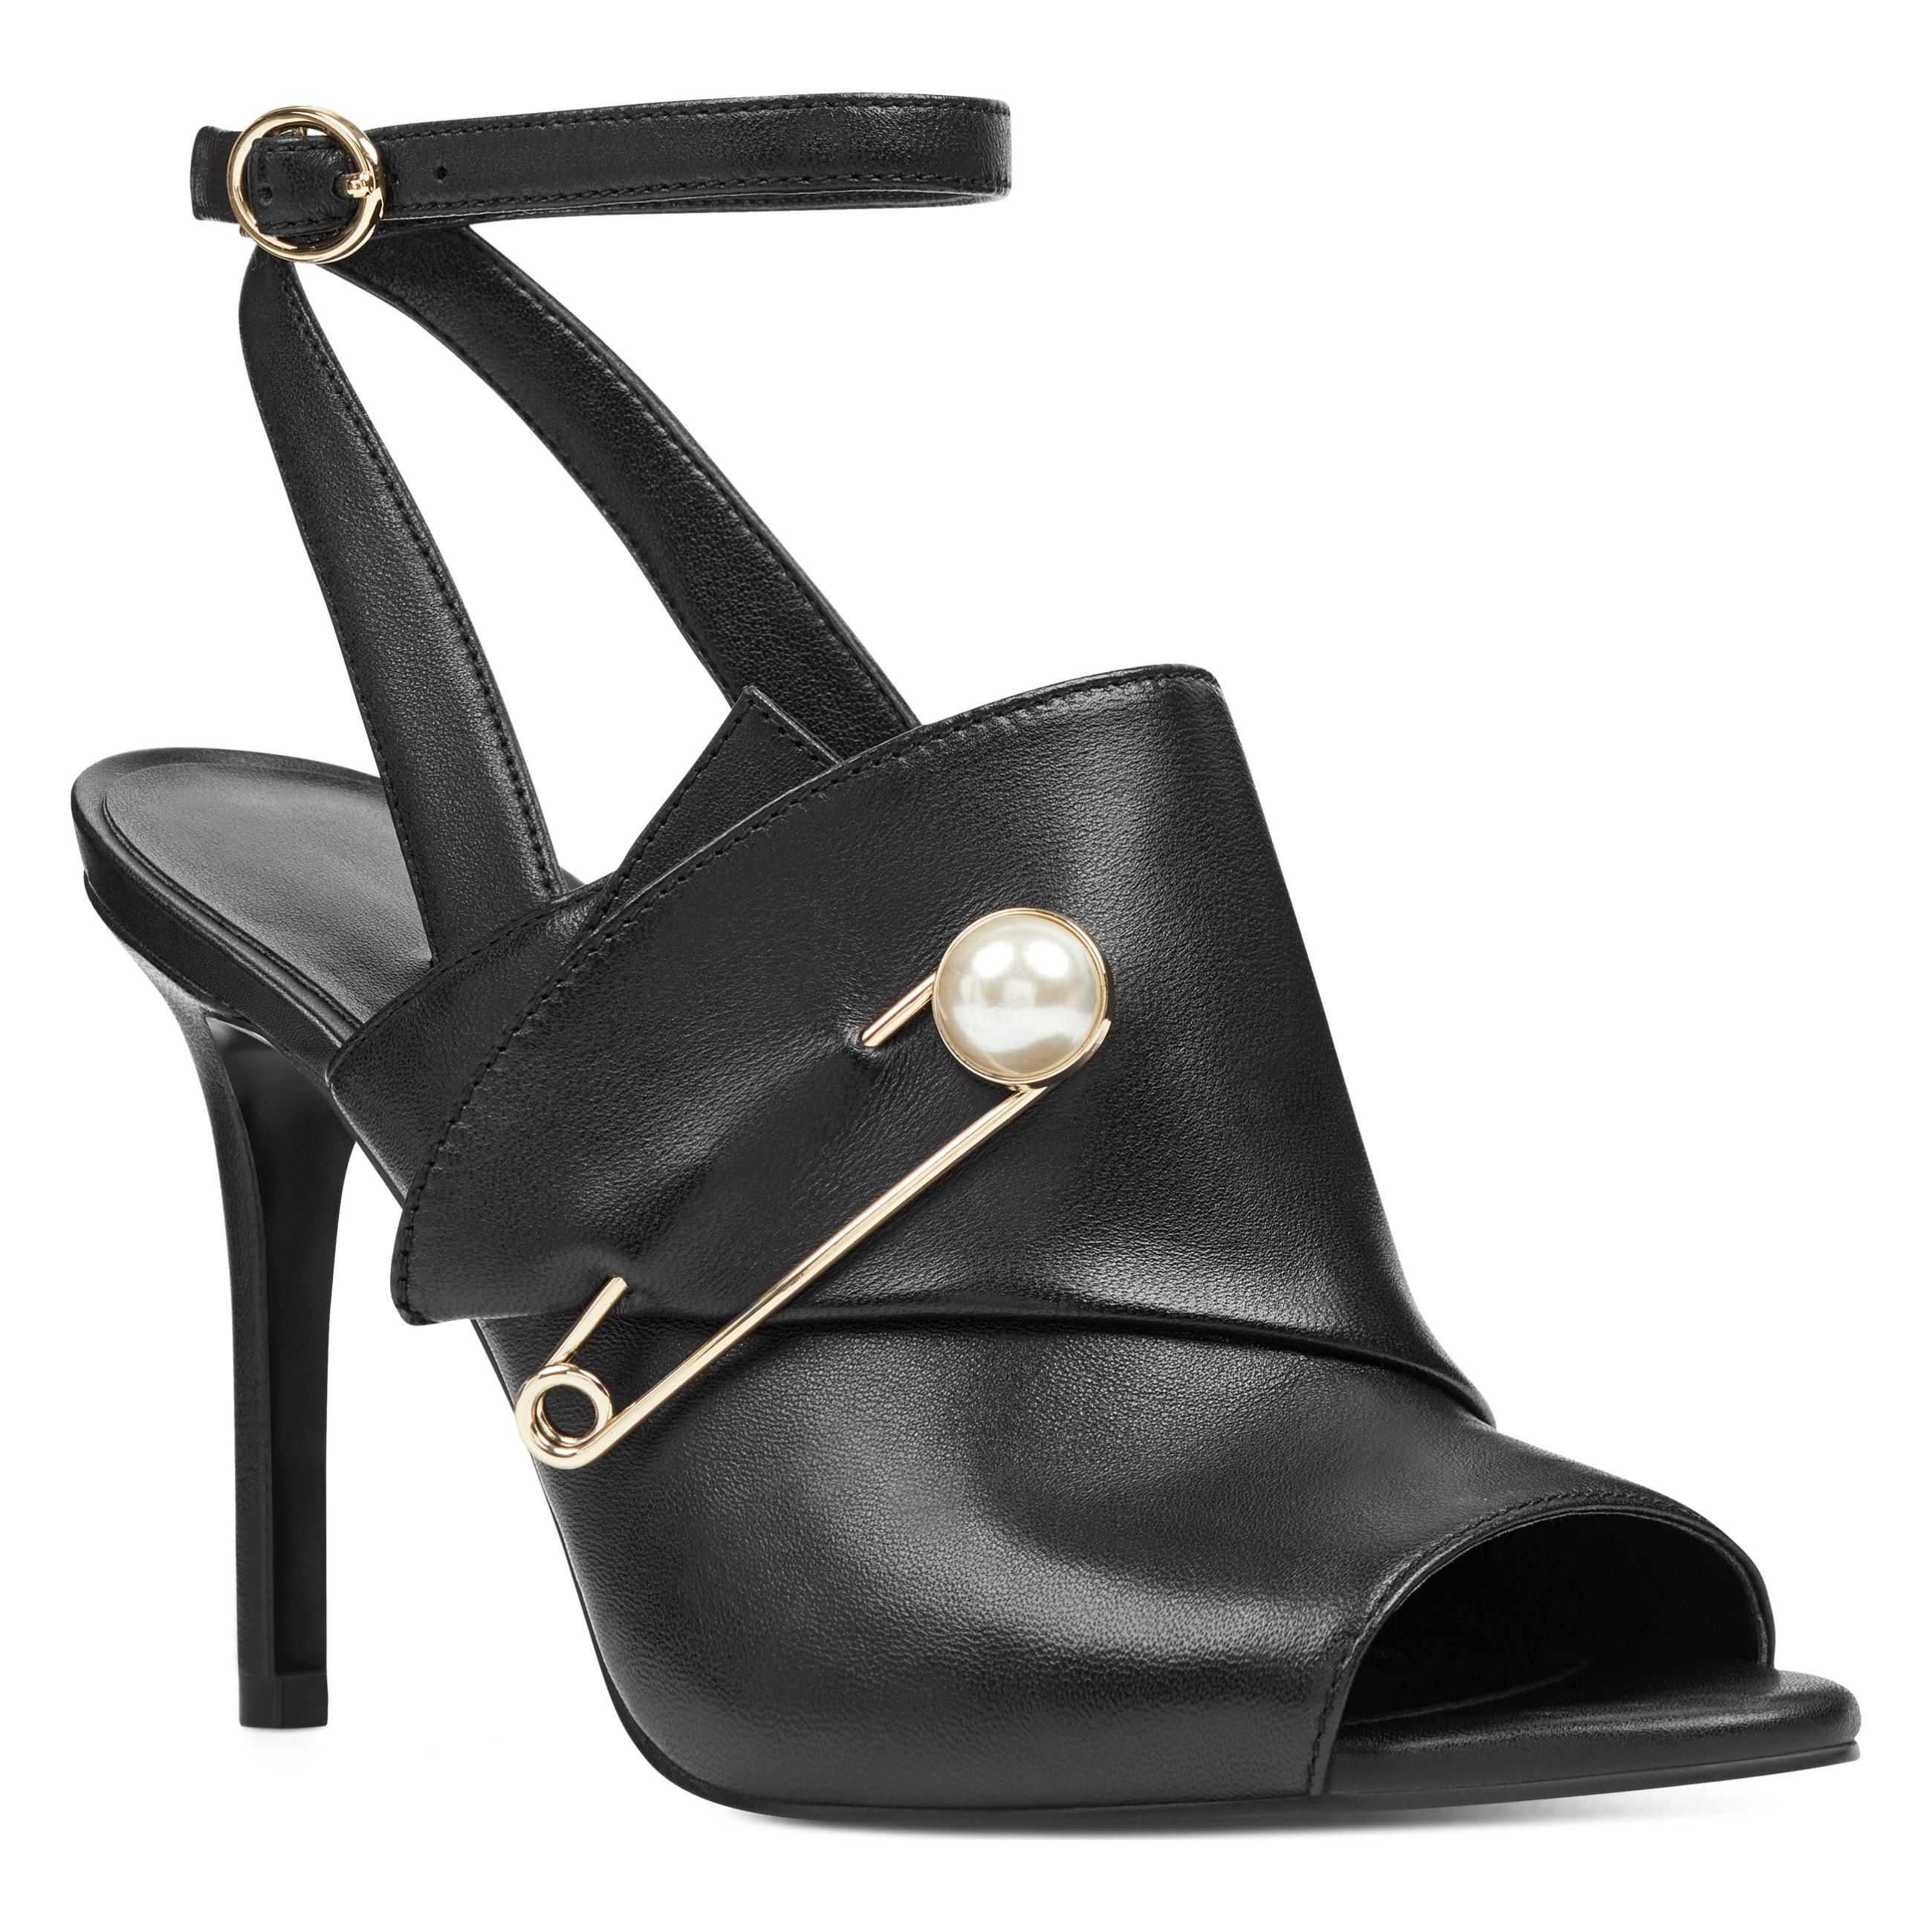 27a241b24e0344 Nine West - Black Matilde Ankle Strap Sandals - Lyst. View fullscreen